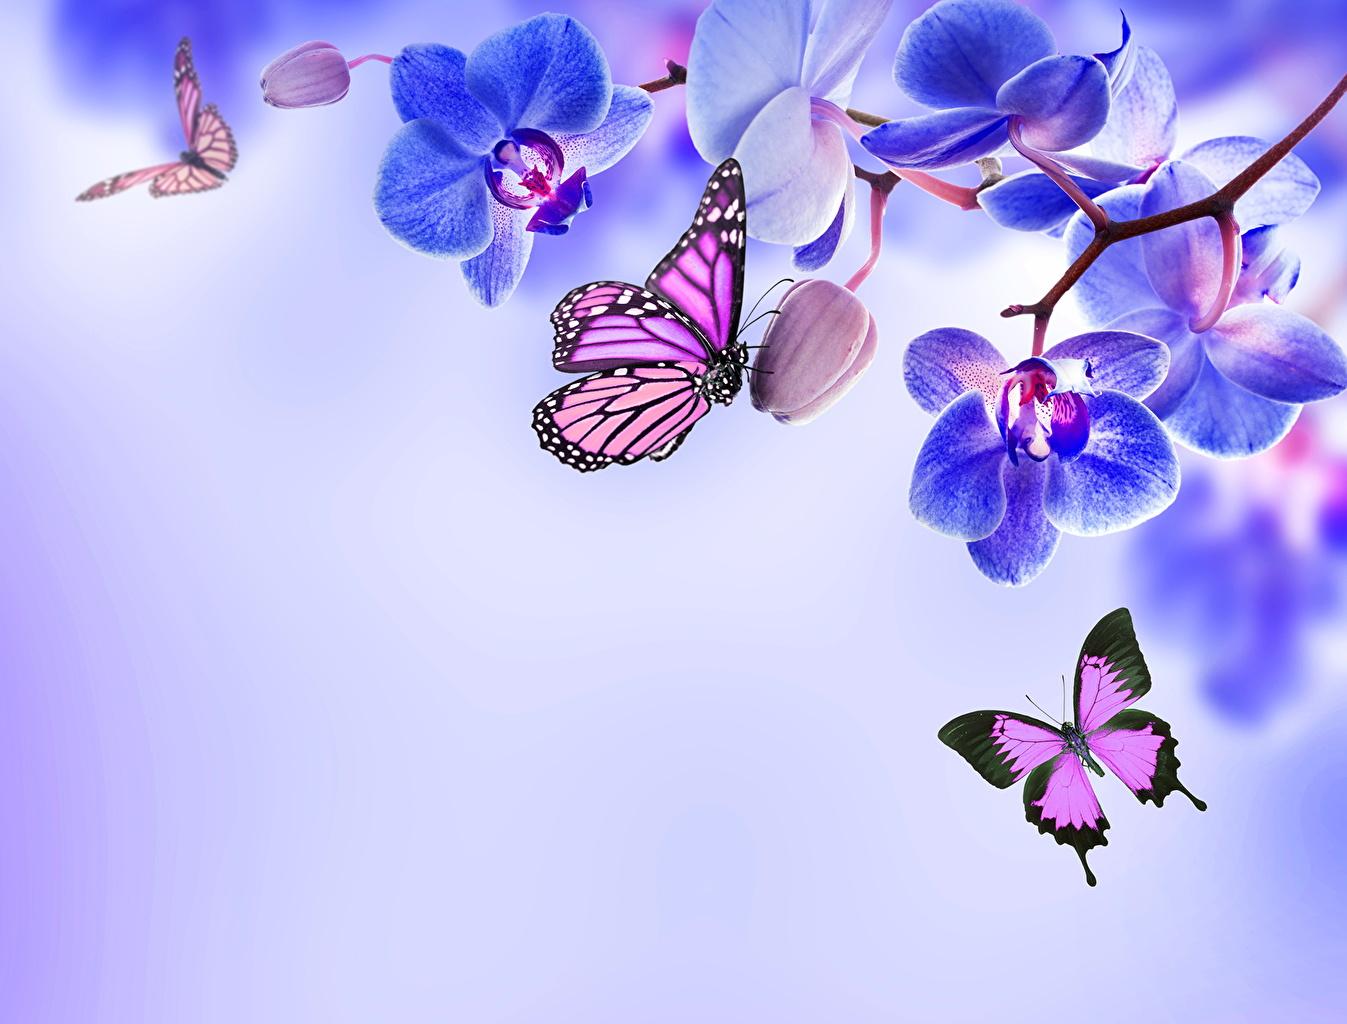 Фотографии Данаида монарх Бабочки Орхидеи Цветы